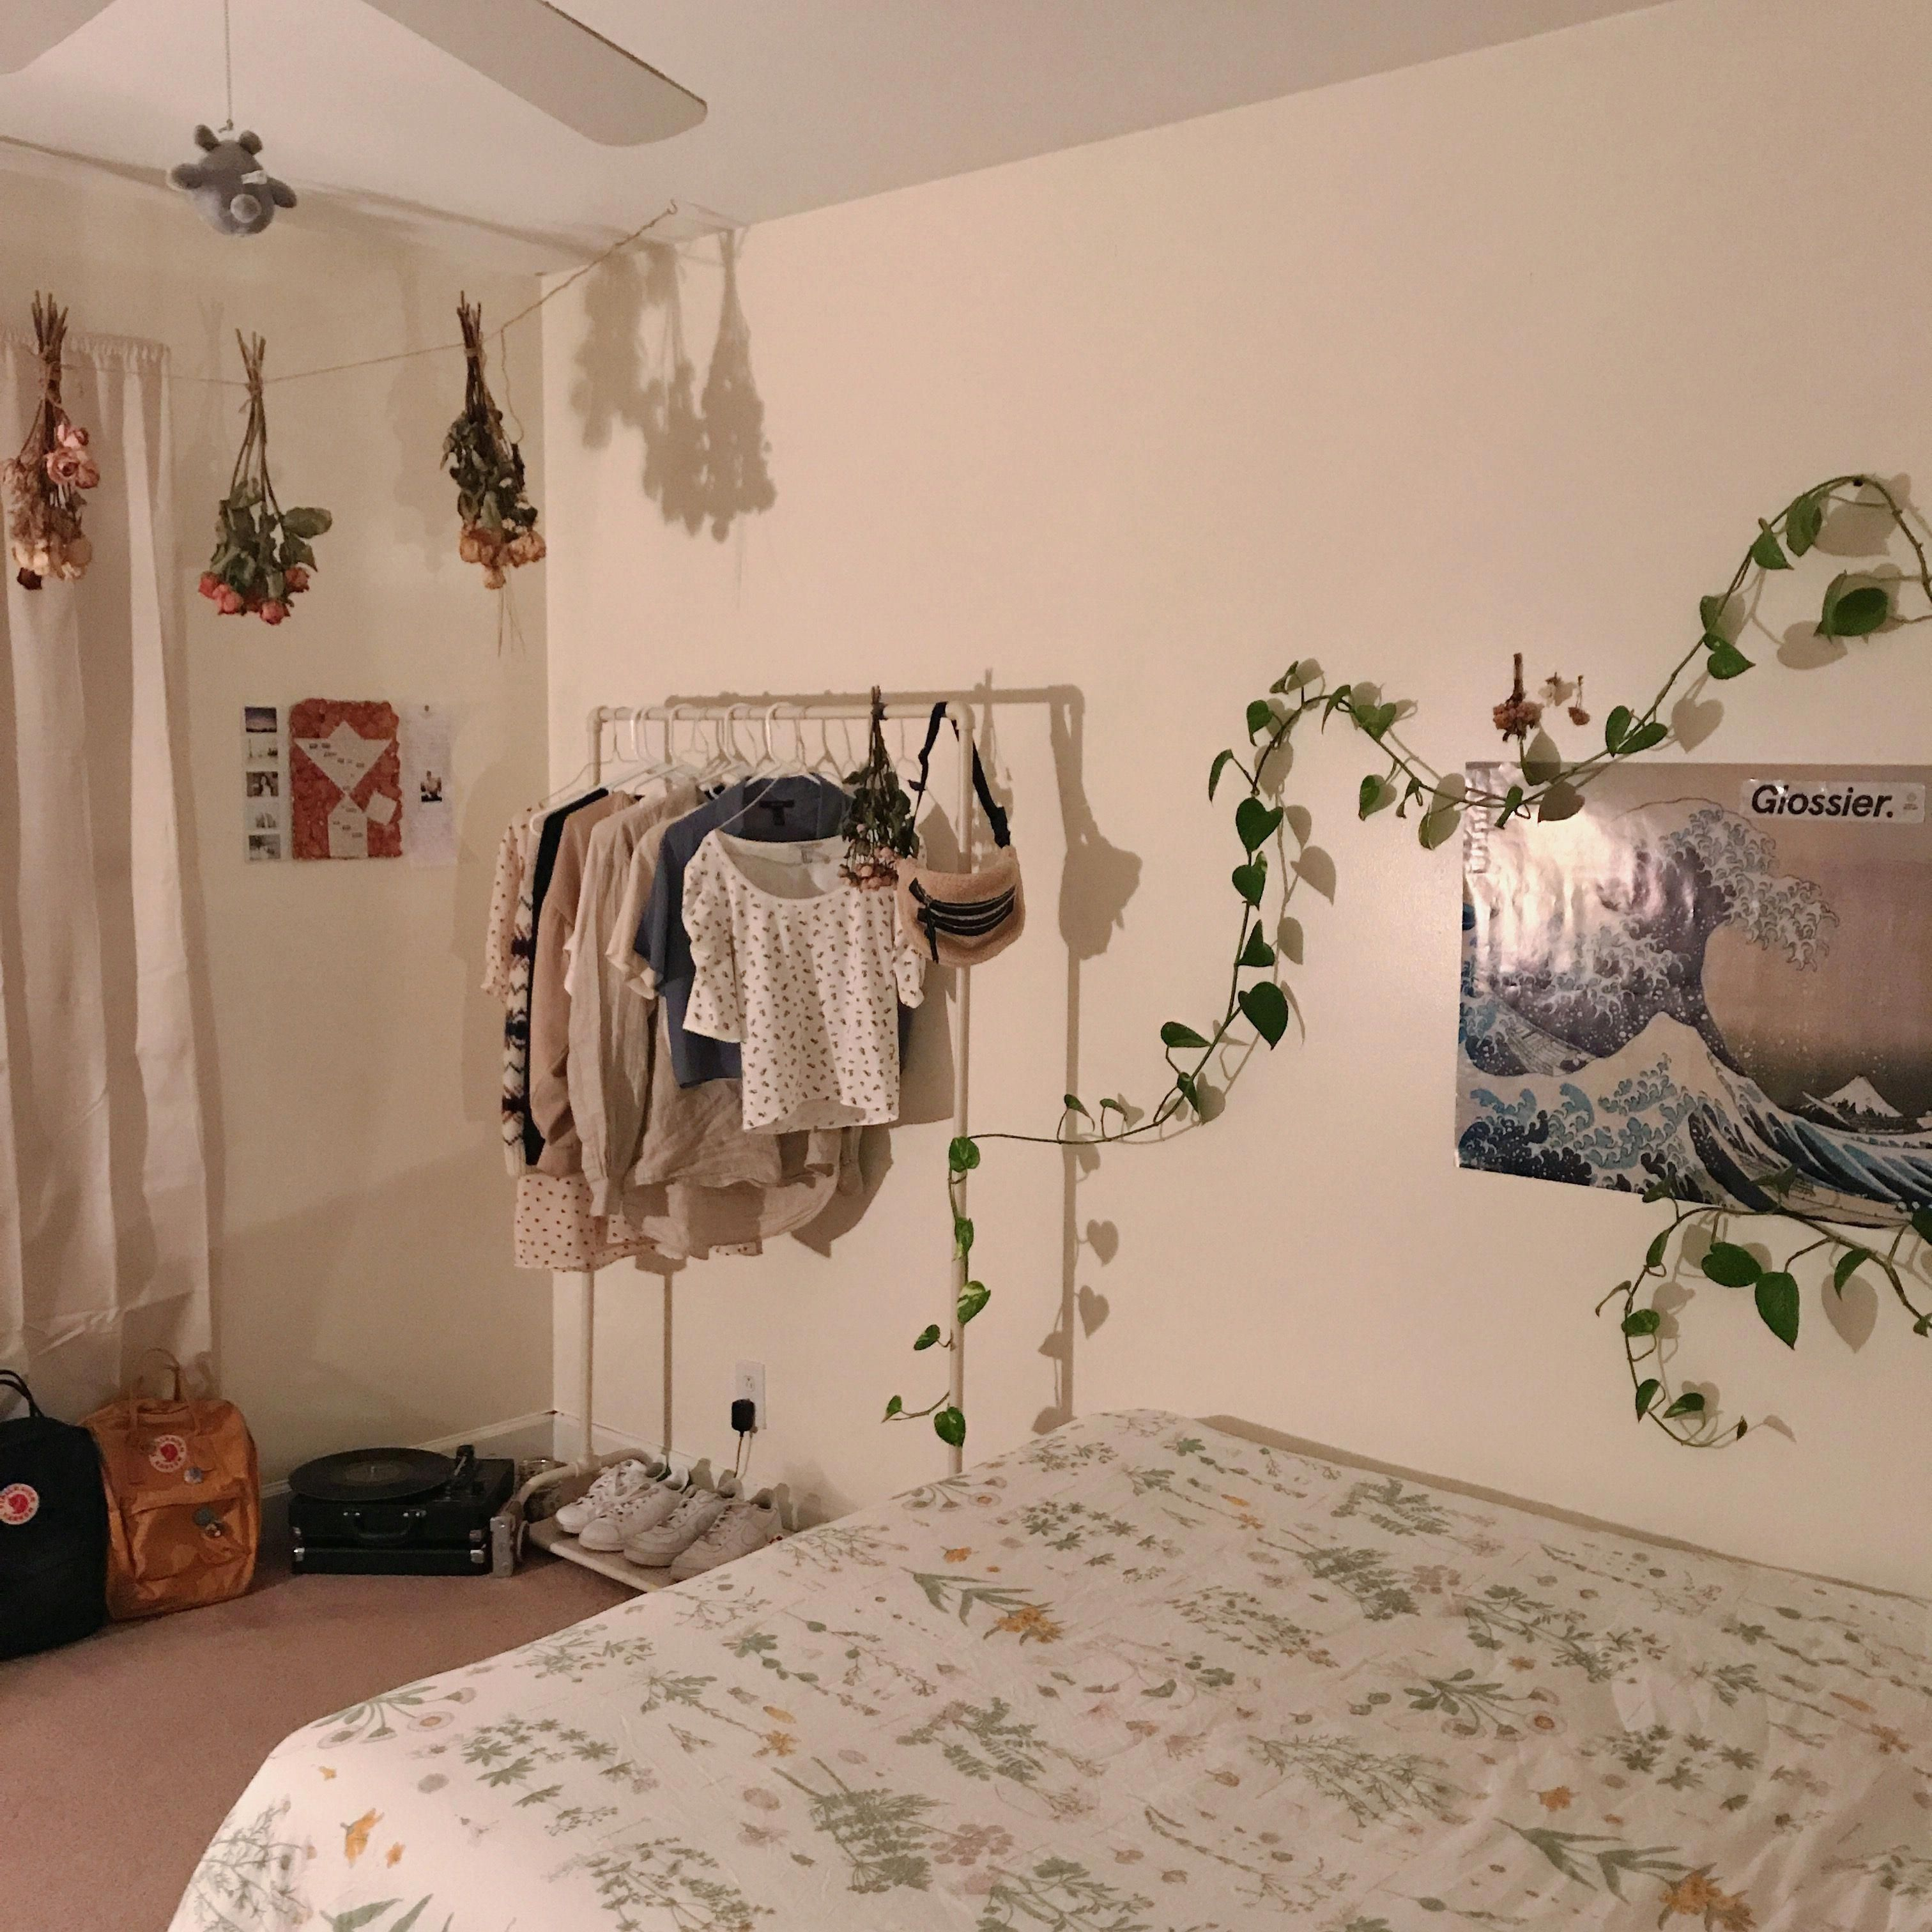 3dinteriordesign Aesthetic Bedroom Apartment Living Room Room